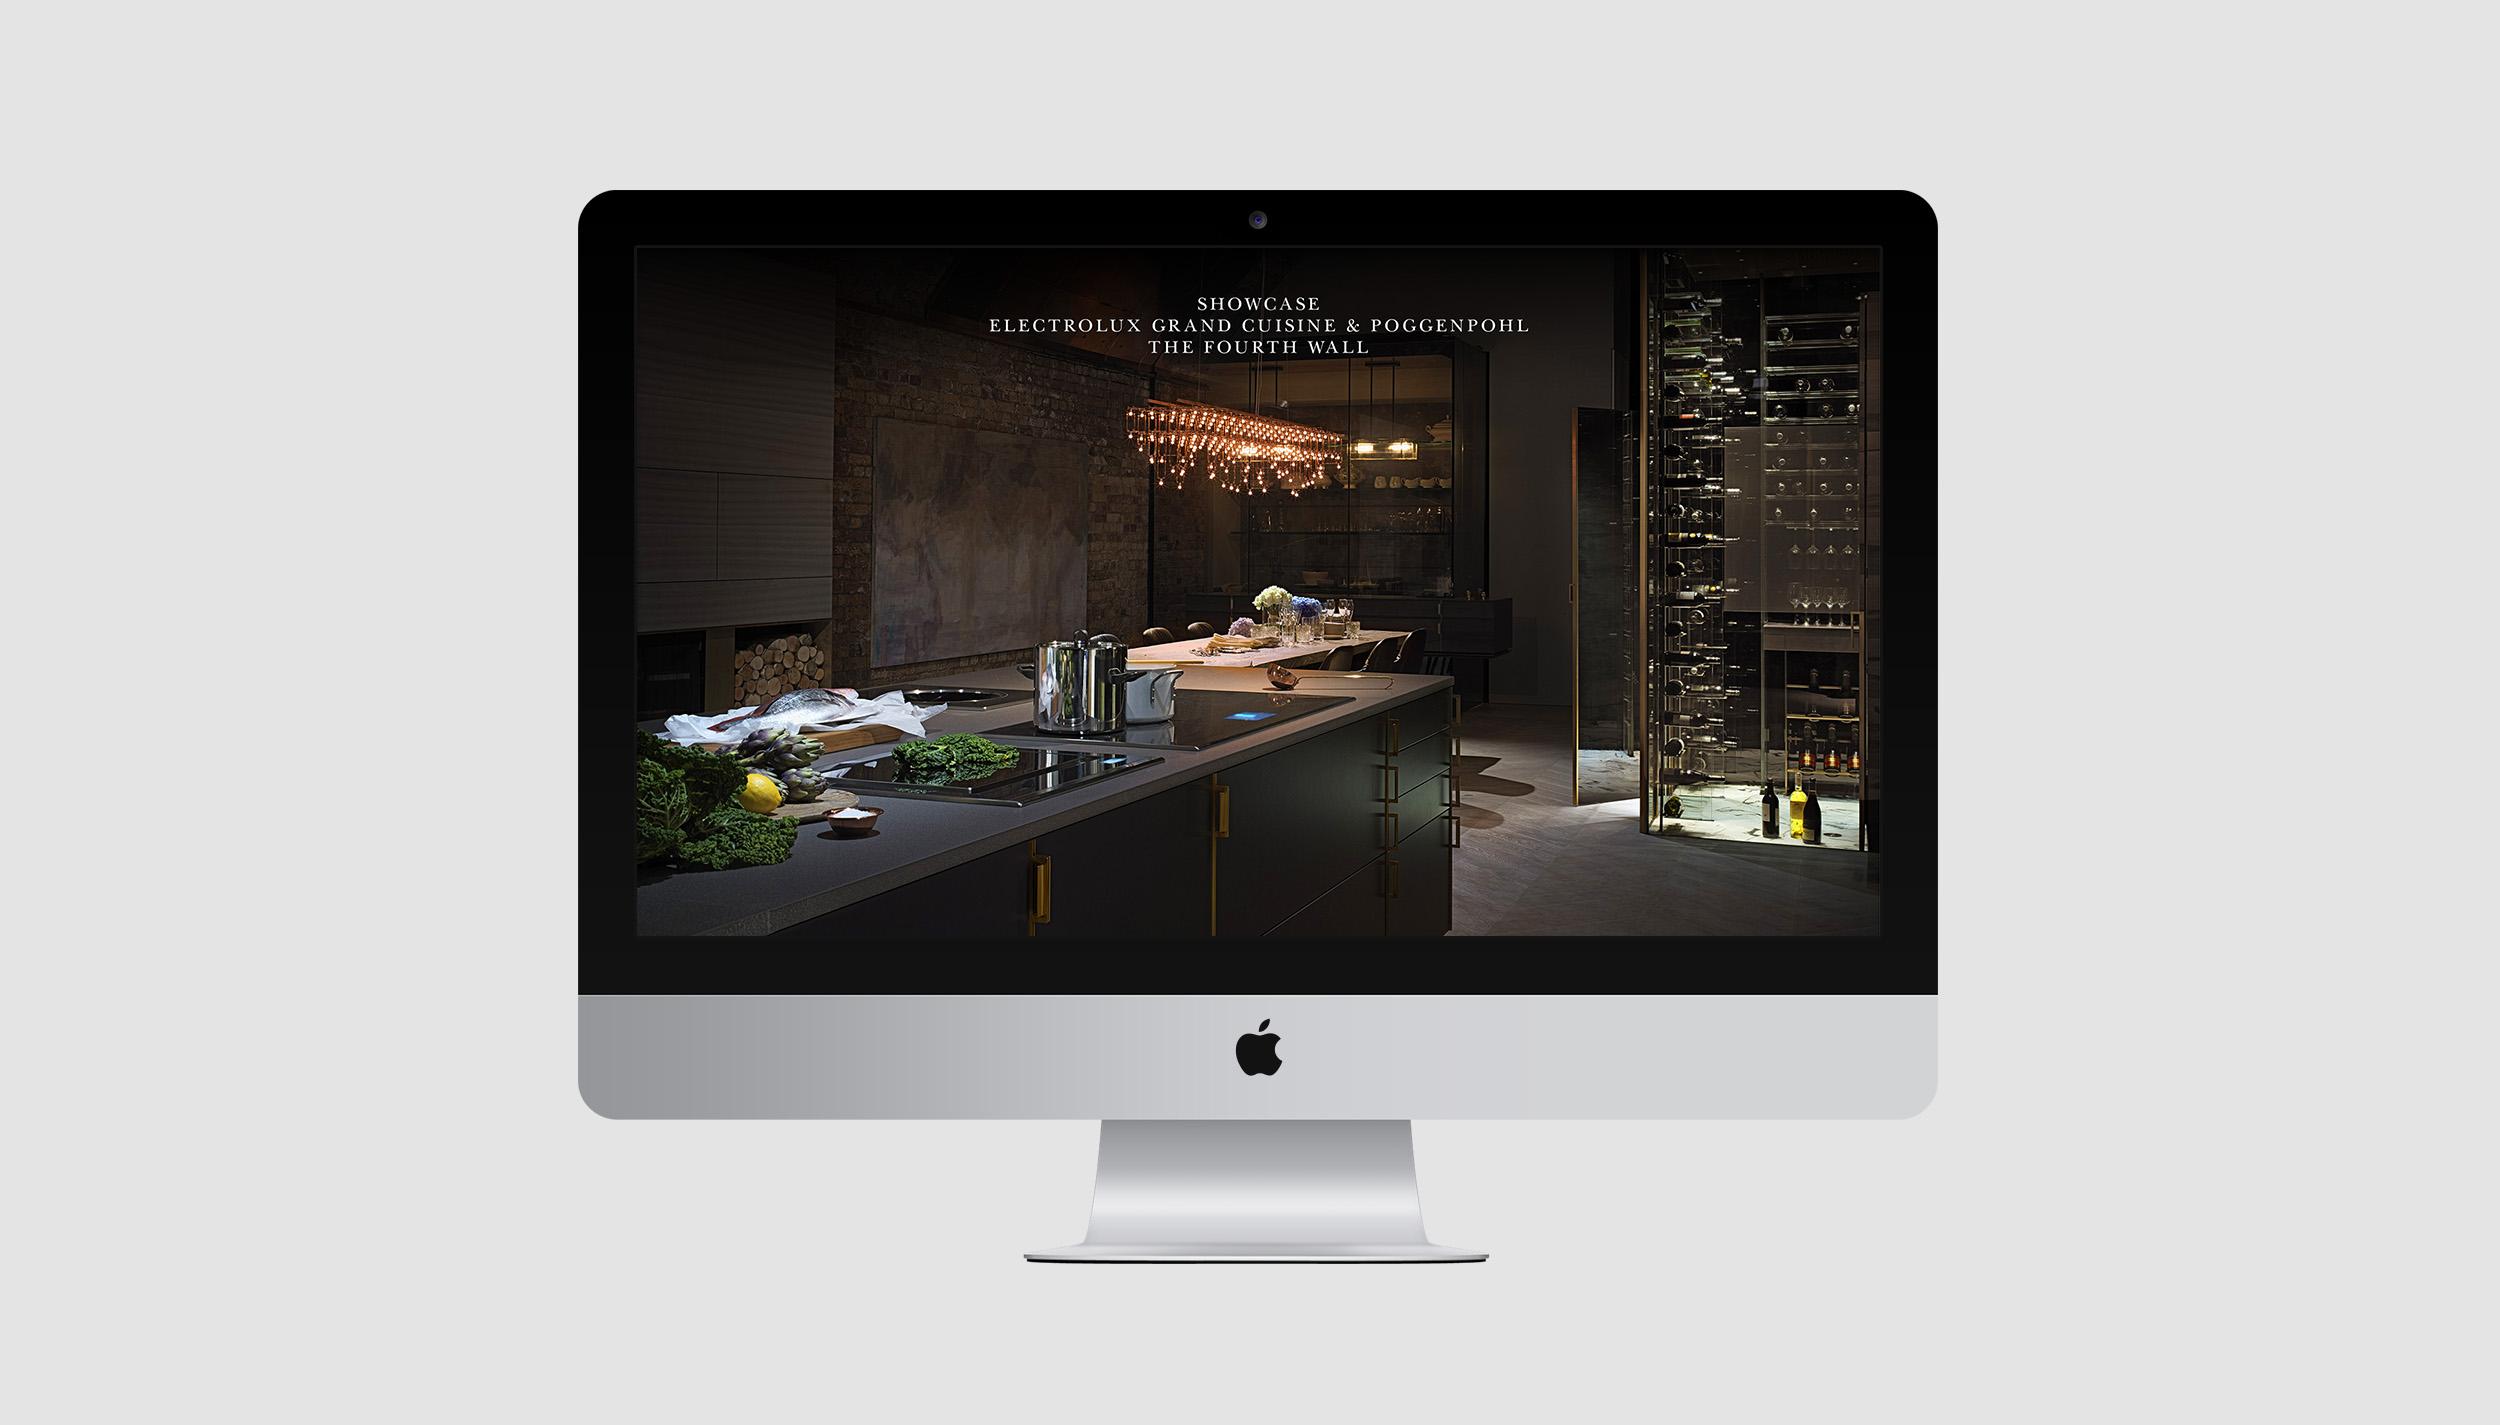 Anders Nord_Electrolux_Grand Cuisine_19.jpg